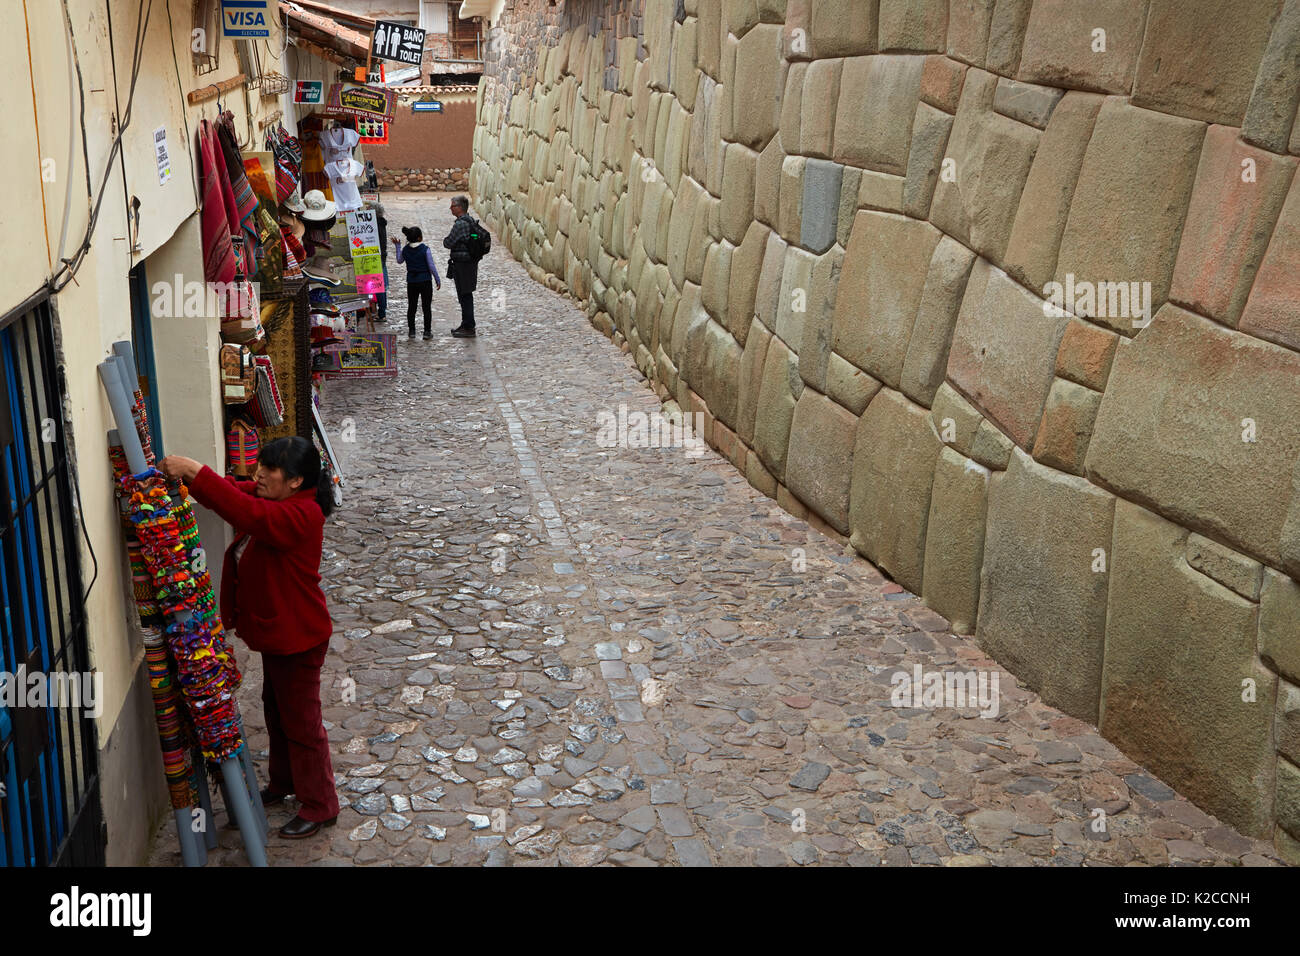 Historic Inca stonework and oturist shops, Inca Roca, Cusco, Peru, South America - Stock Image